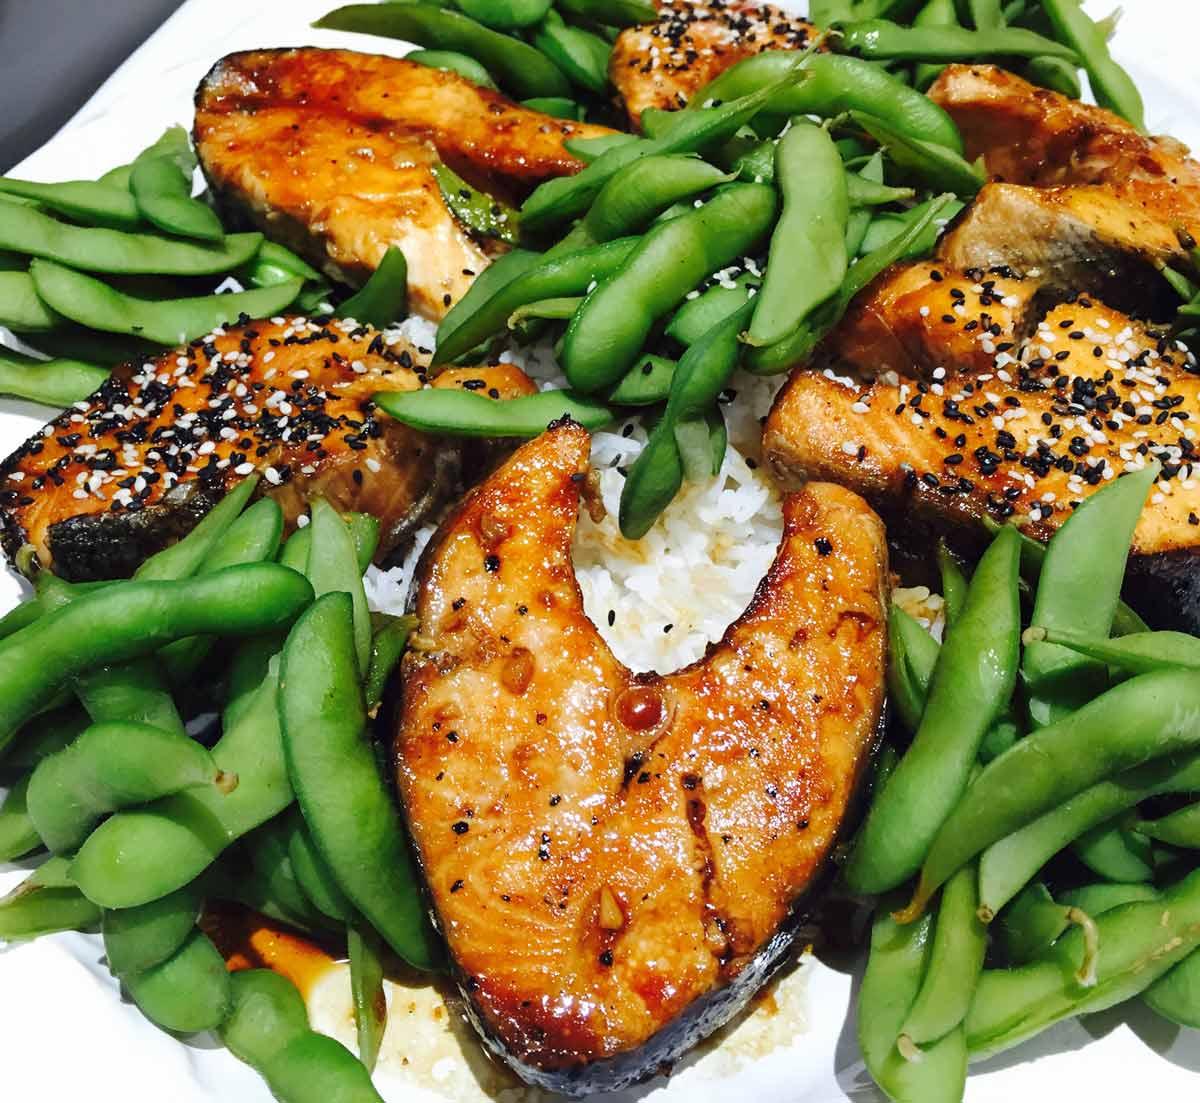 Salmon teriyaki with edamame and rice, on a white plate